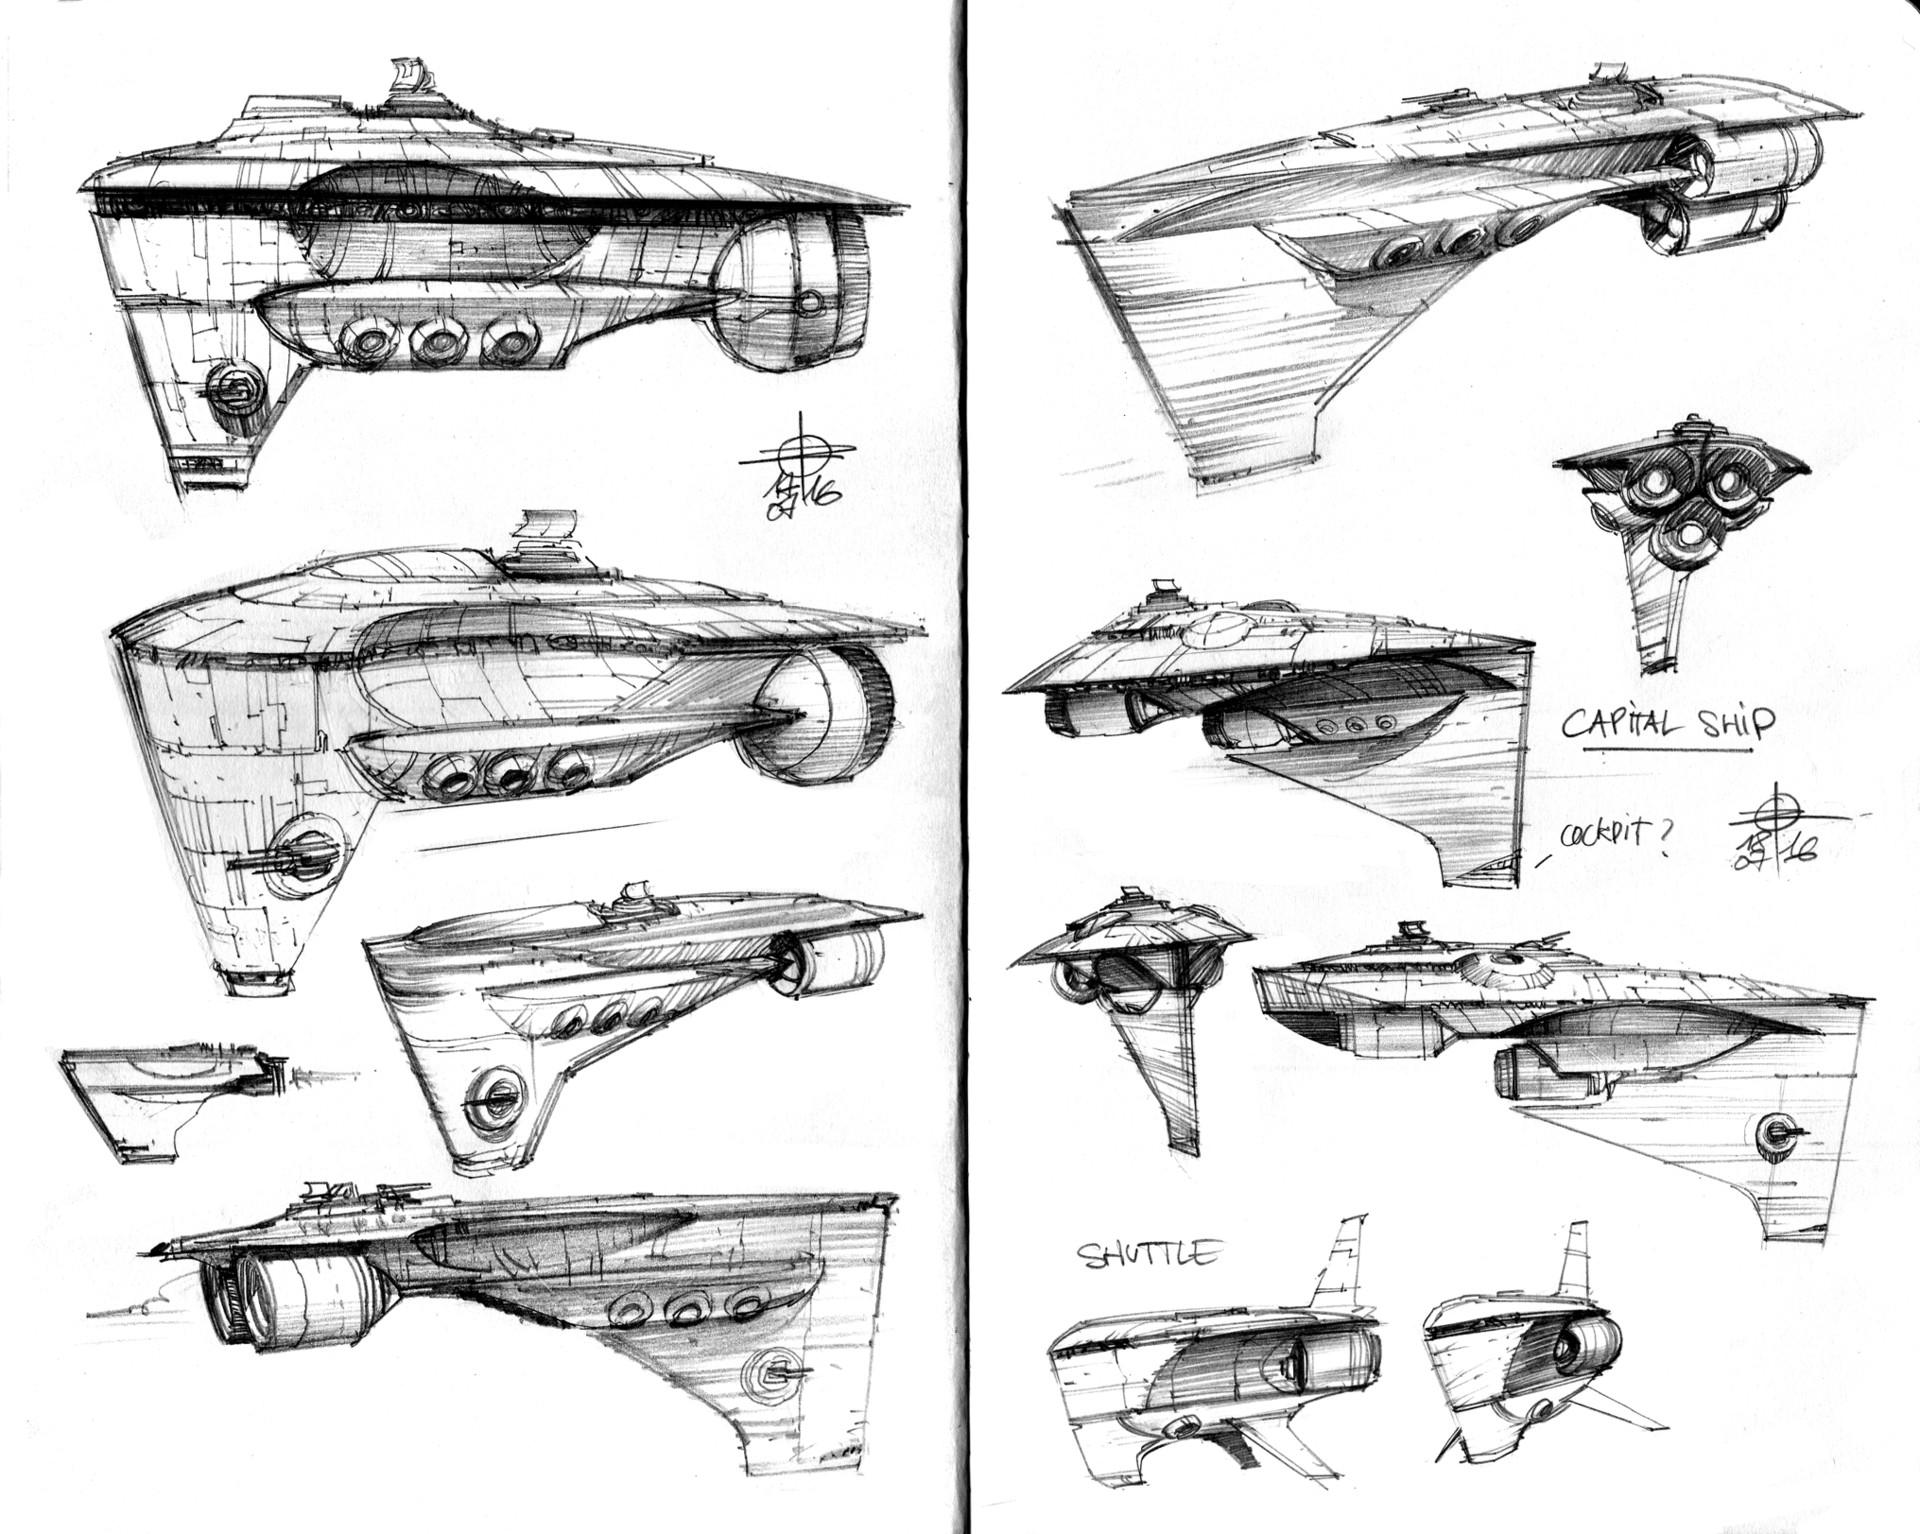 Renaud roche part02 sketches02b